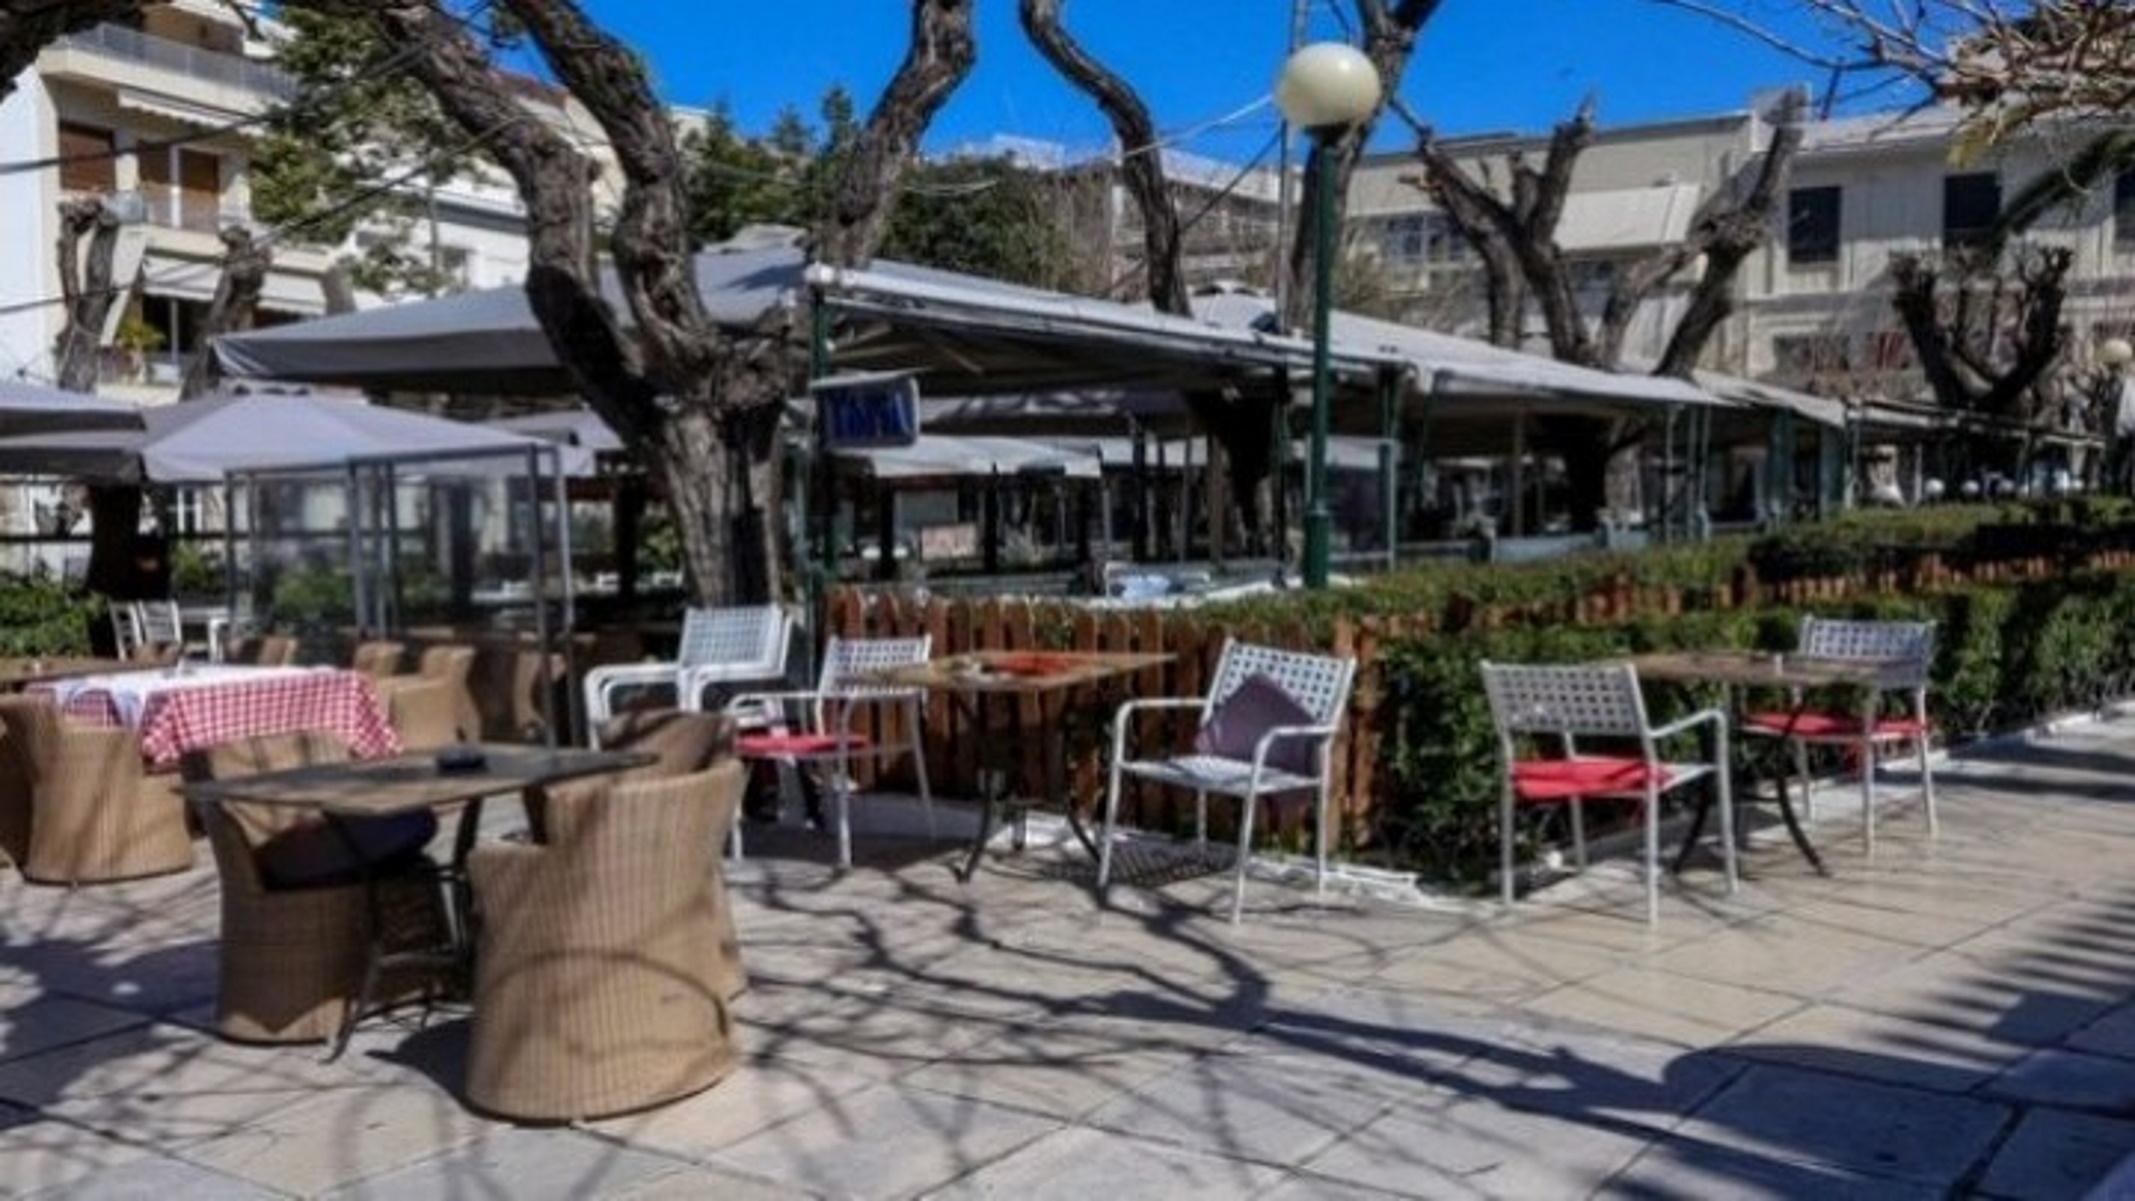 Lockdown – Ιωάννινα: «Πικροί» καφέδες – Πρόστιμα 4.000 ευρώ σε ιδιοκτήτη καφετέριας και πελάτες